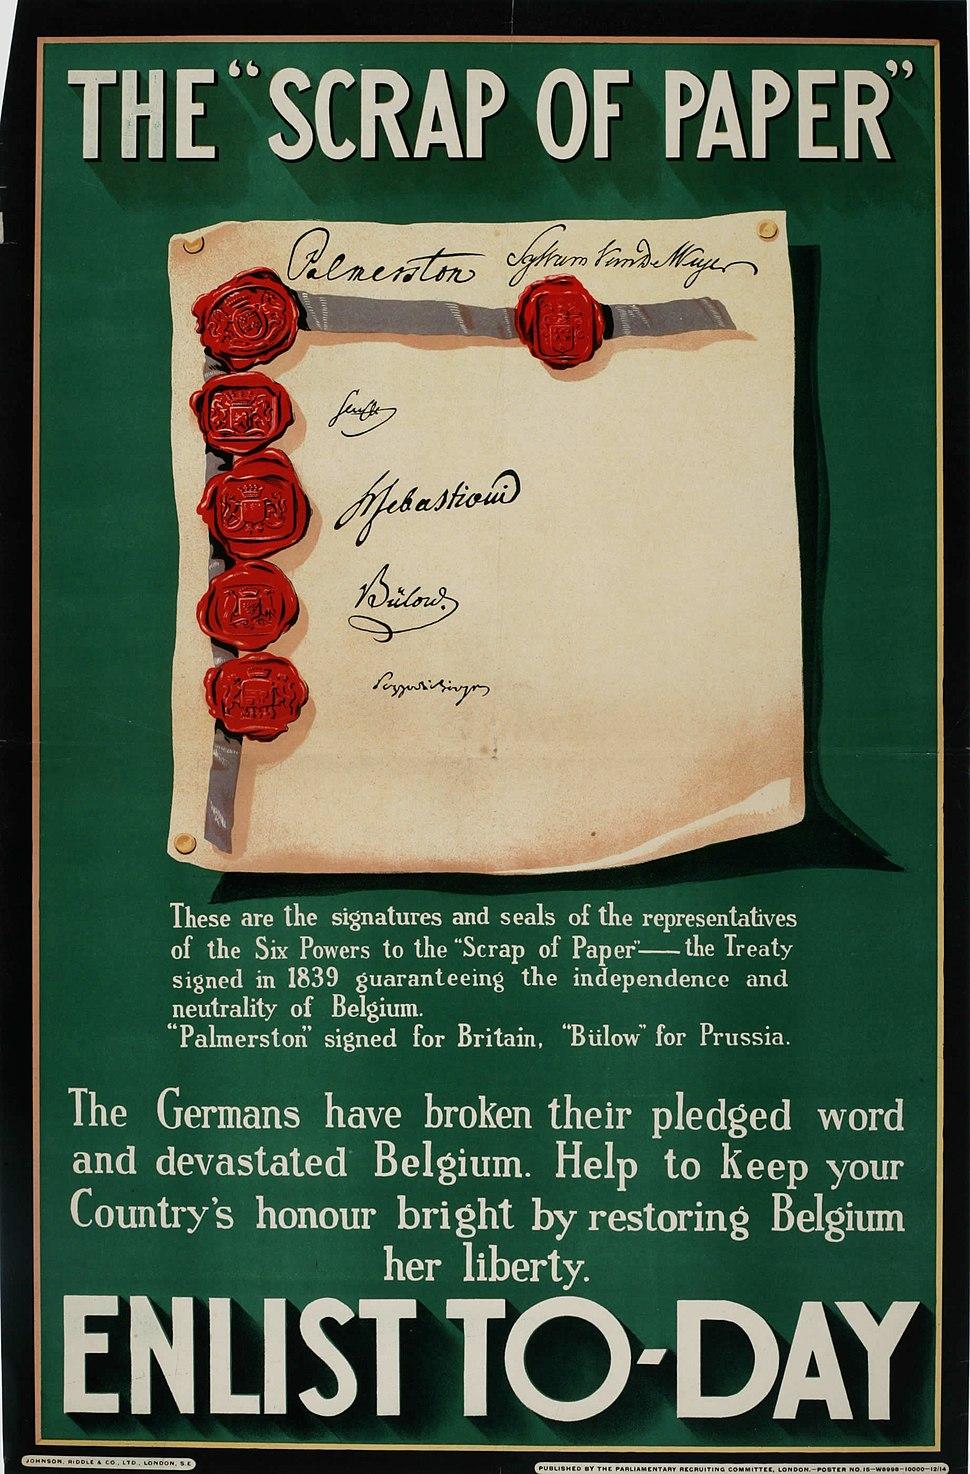 The Scrap of Paper - Enlist Today